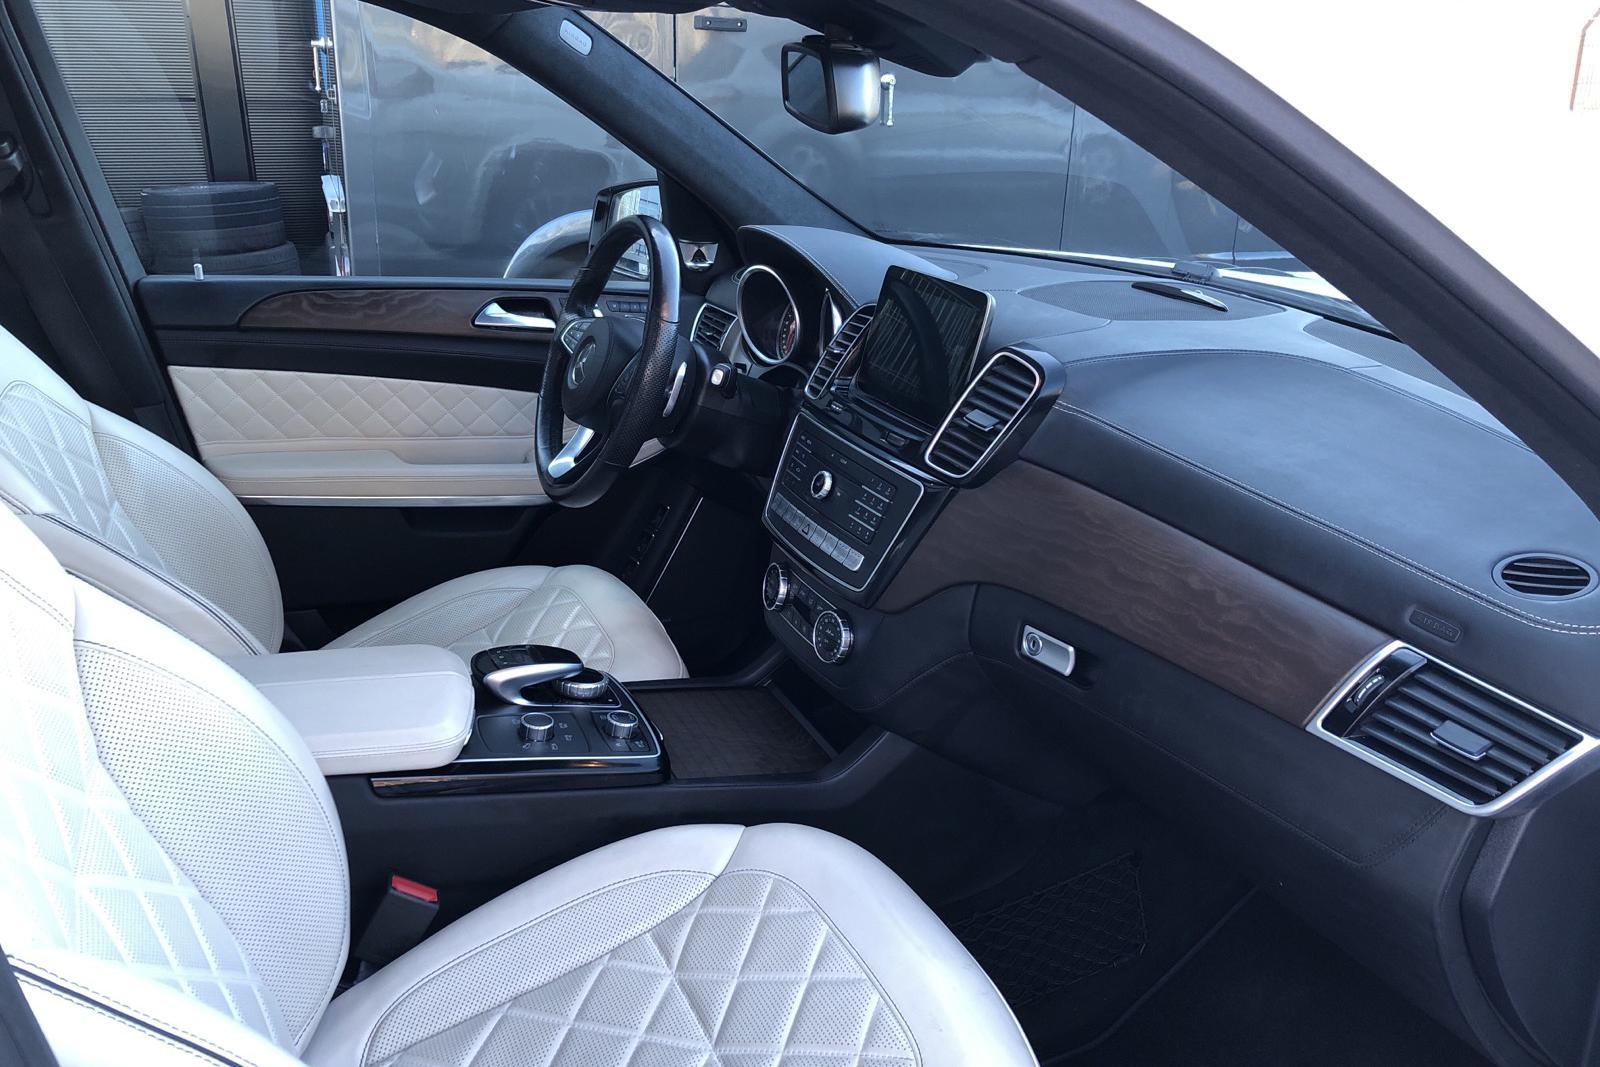 Mercedes GLS 500 4MATIC X166 (455hk) - 12 672 mil - Automat - vit - 2016